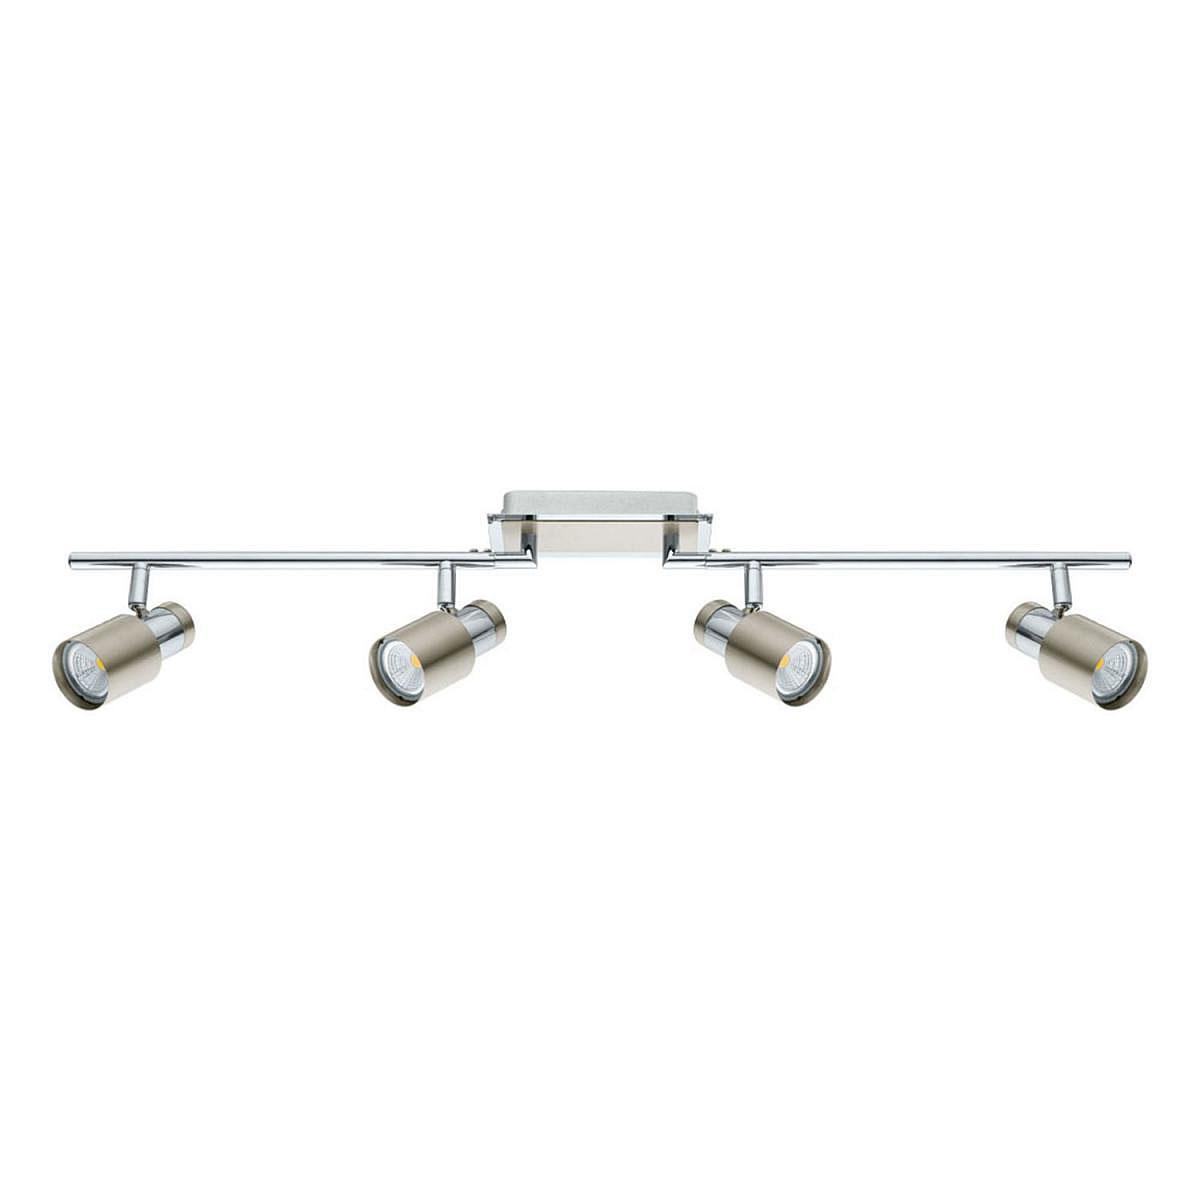 "LED-Spot ""Davida-SD"", 4x5 W, chrom/nickel-matt | Lampen > Strahler und Systeme > Strahler und Spots | Eglo"